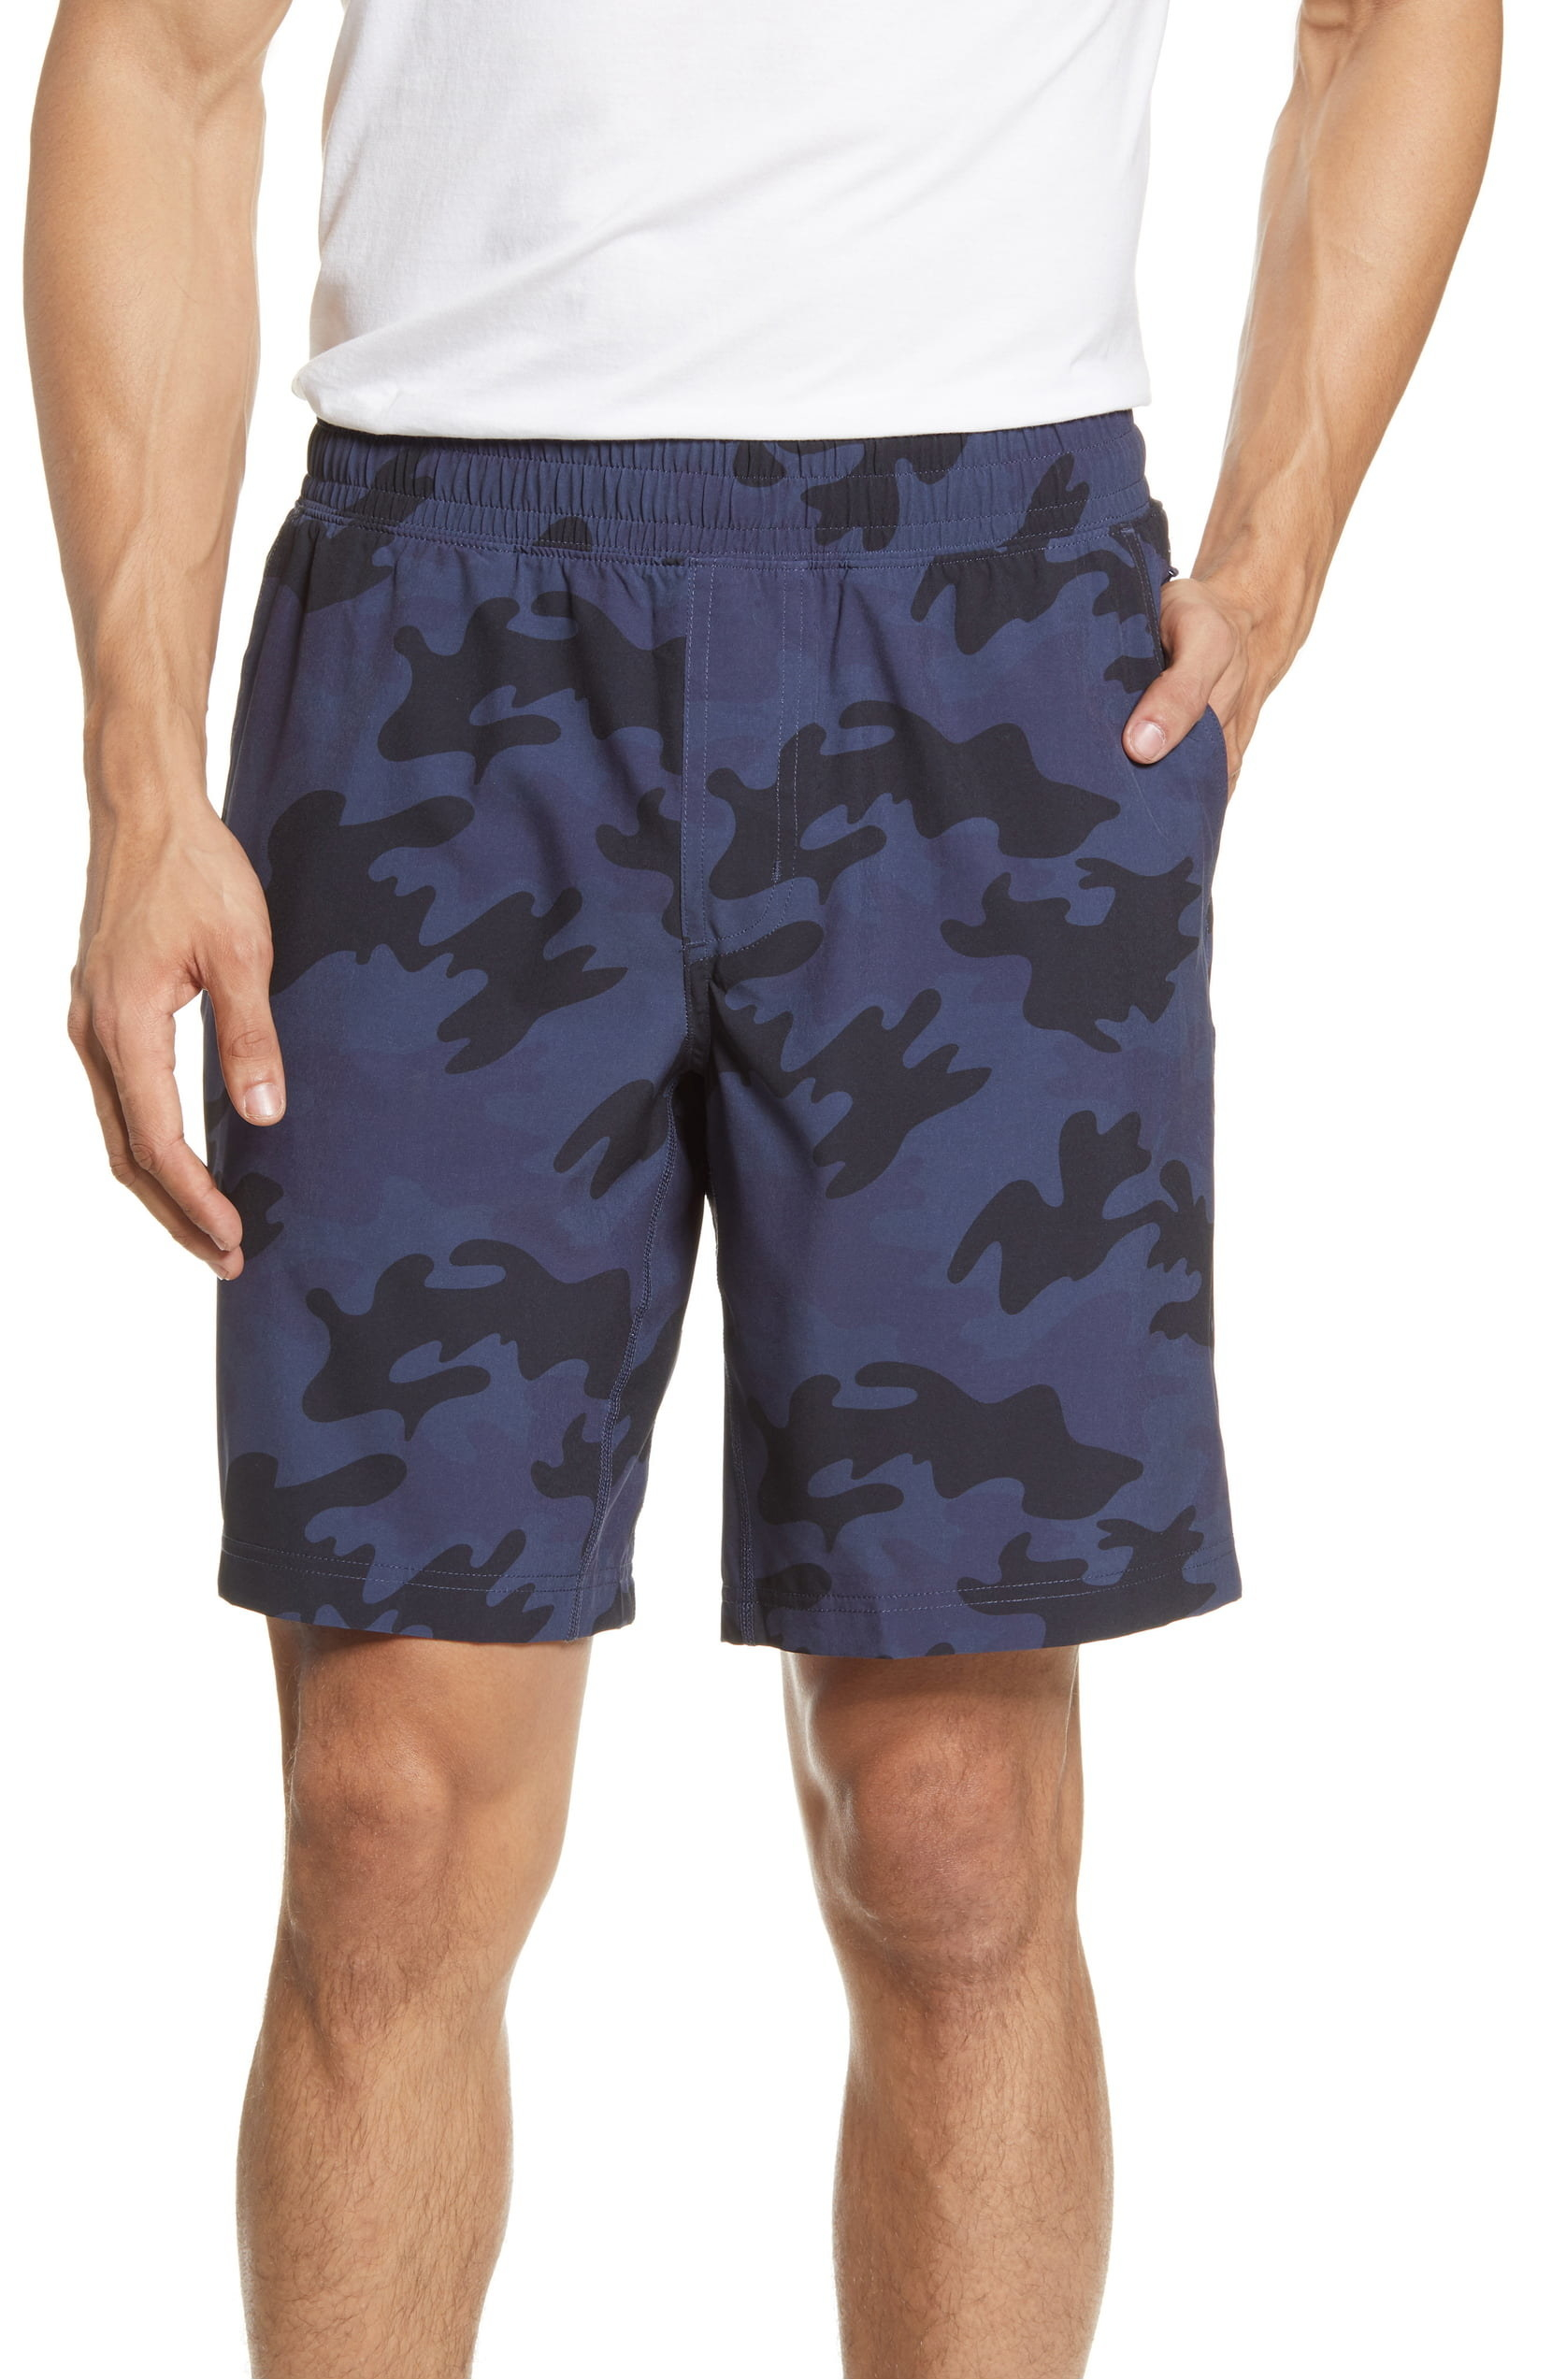 Model wearing Rhone Mako Athletic Shorts